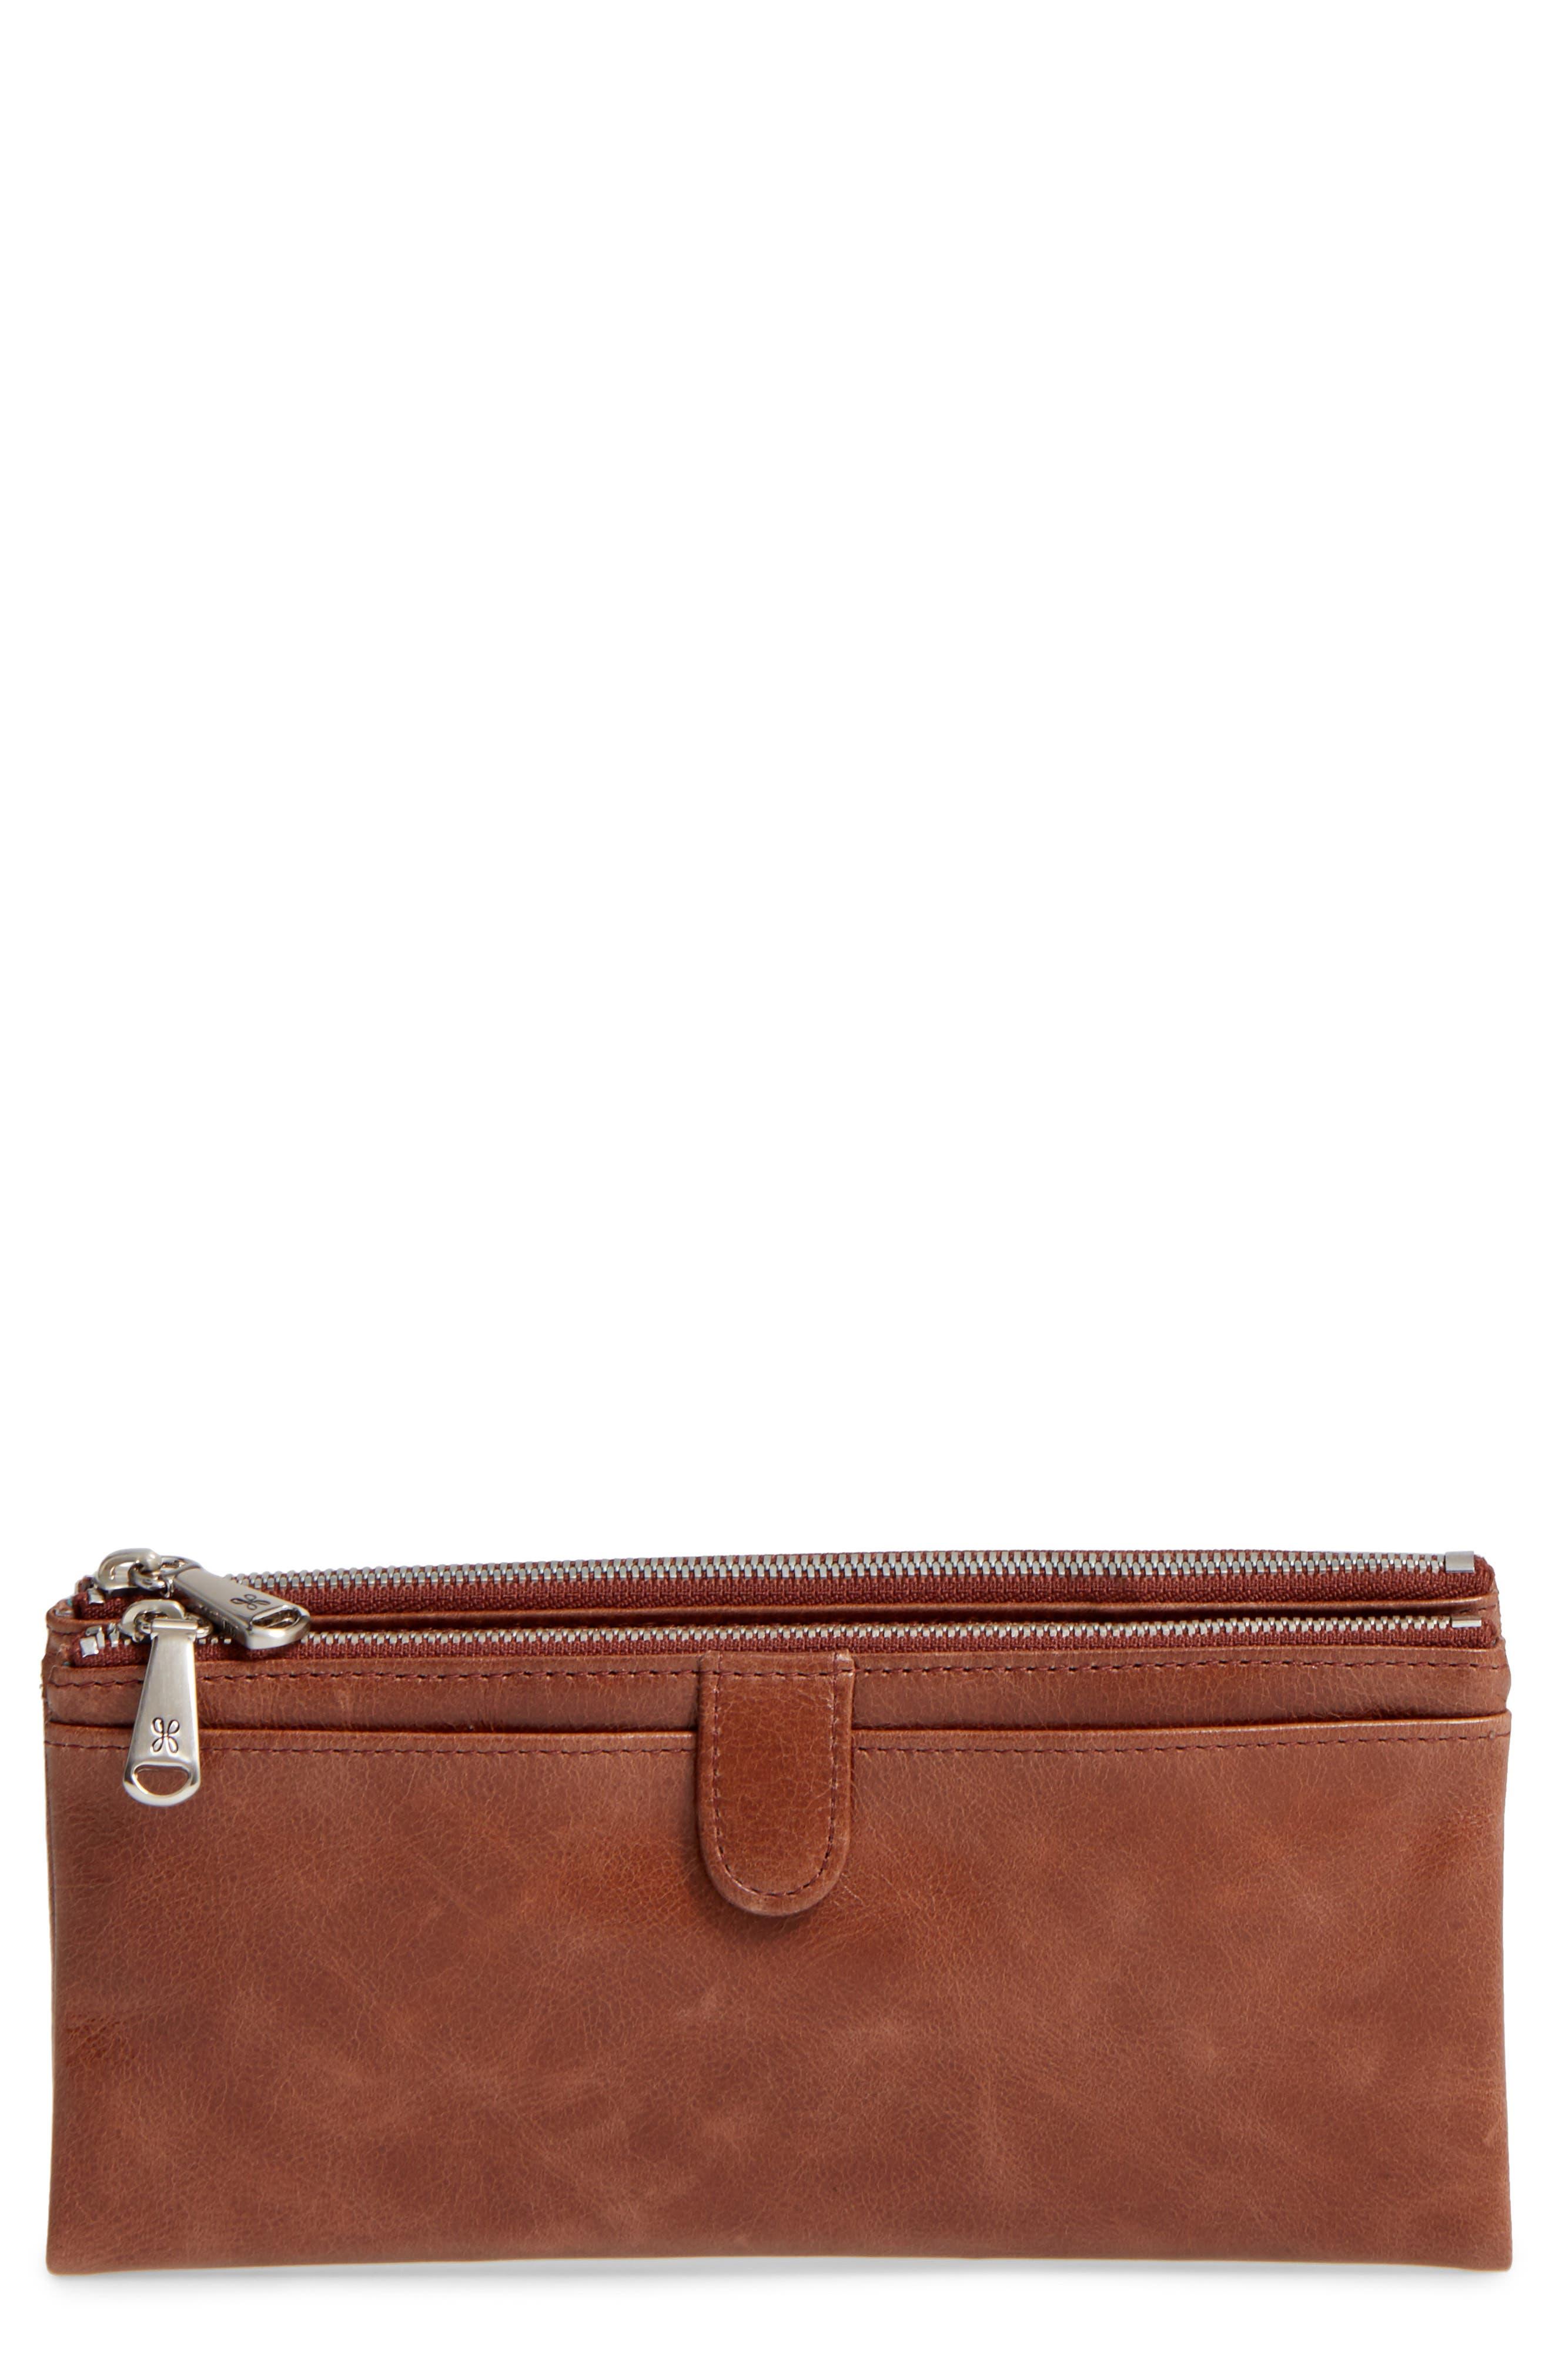 'Taylor' Glazed Leather Wallet,                         Main,                         color, Cafe